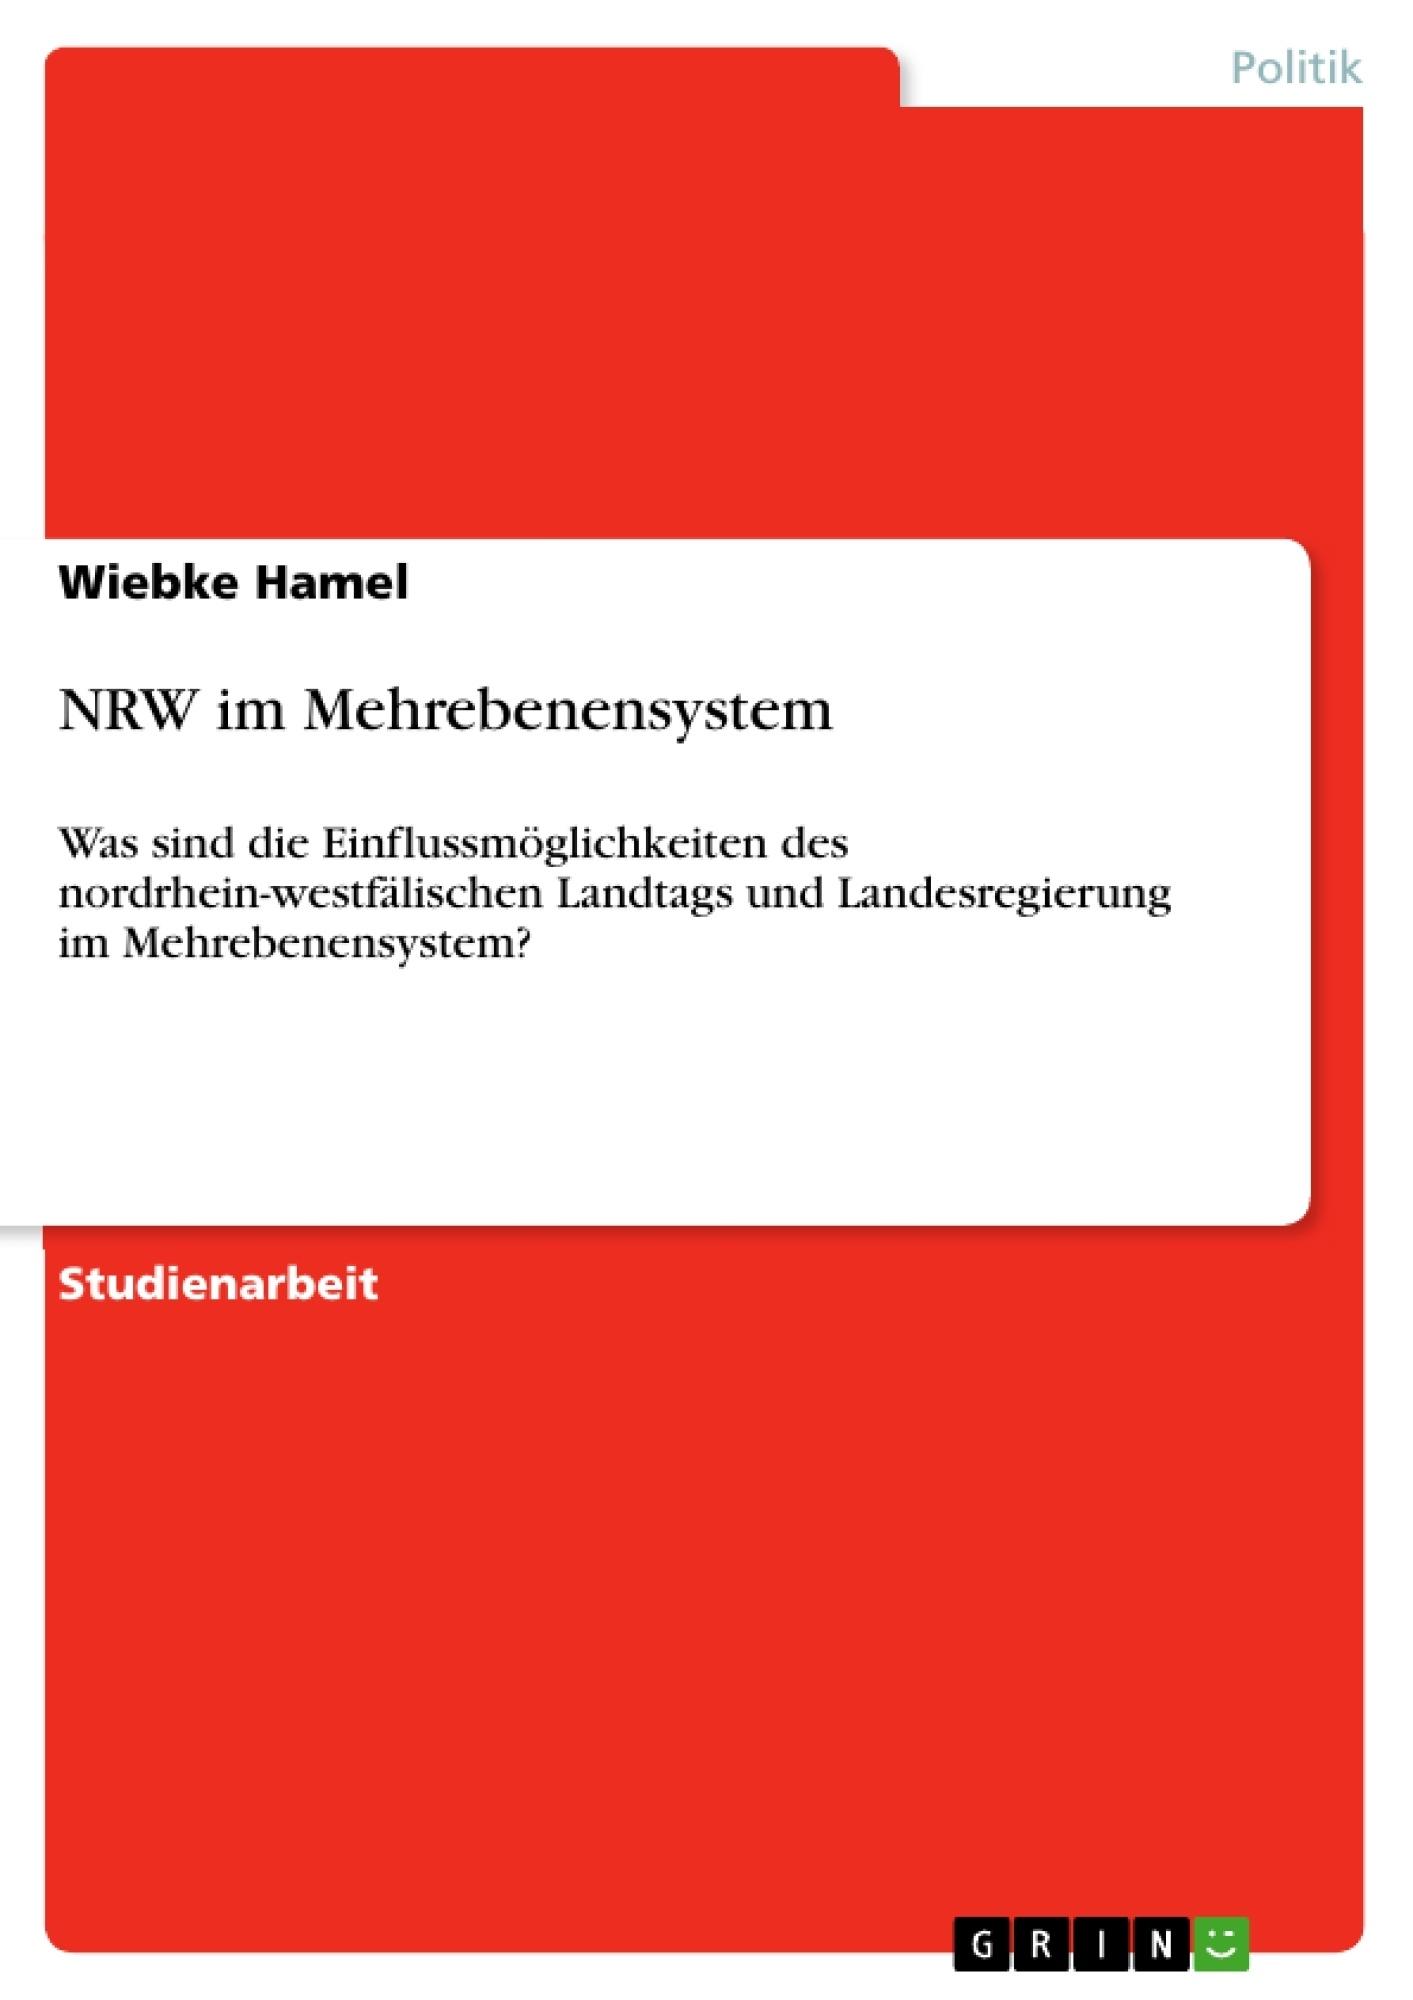 Titel: NRW im Mehrebenensystem